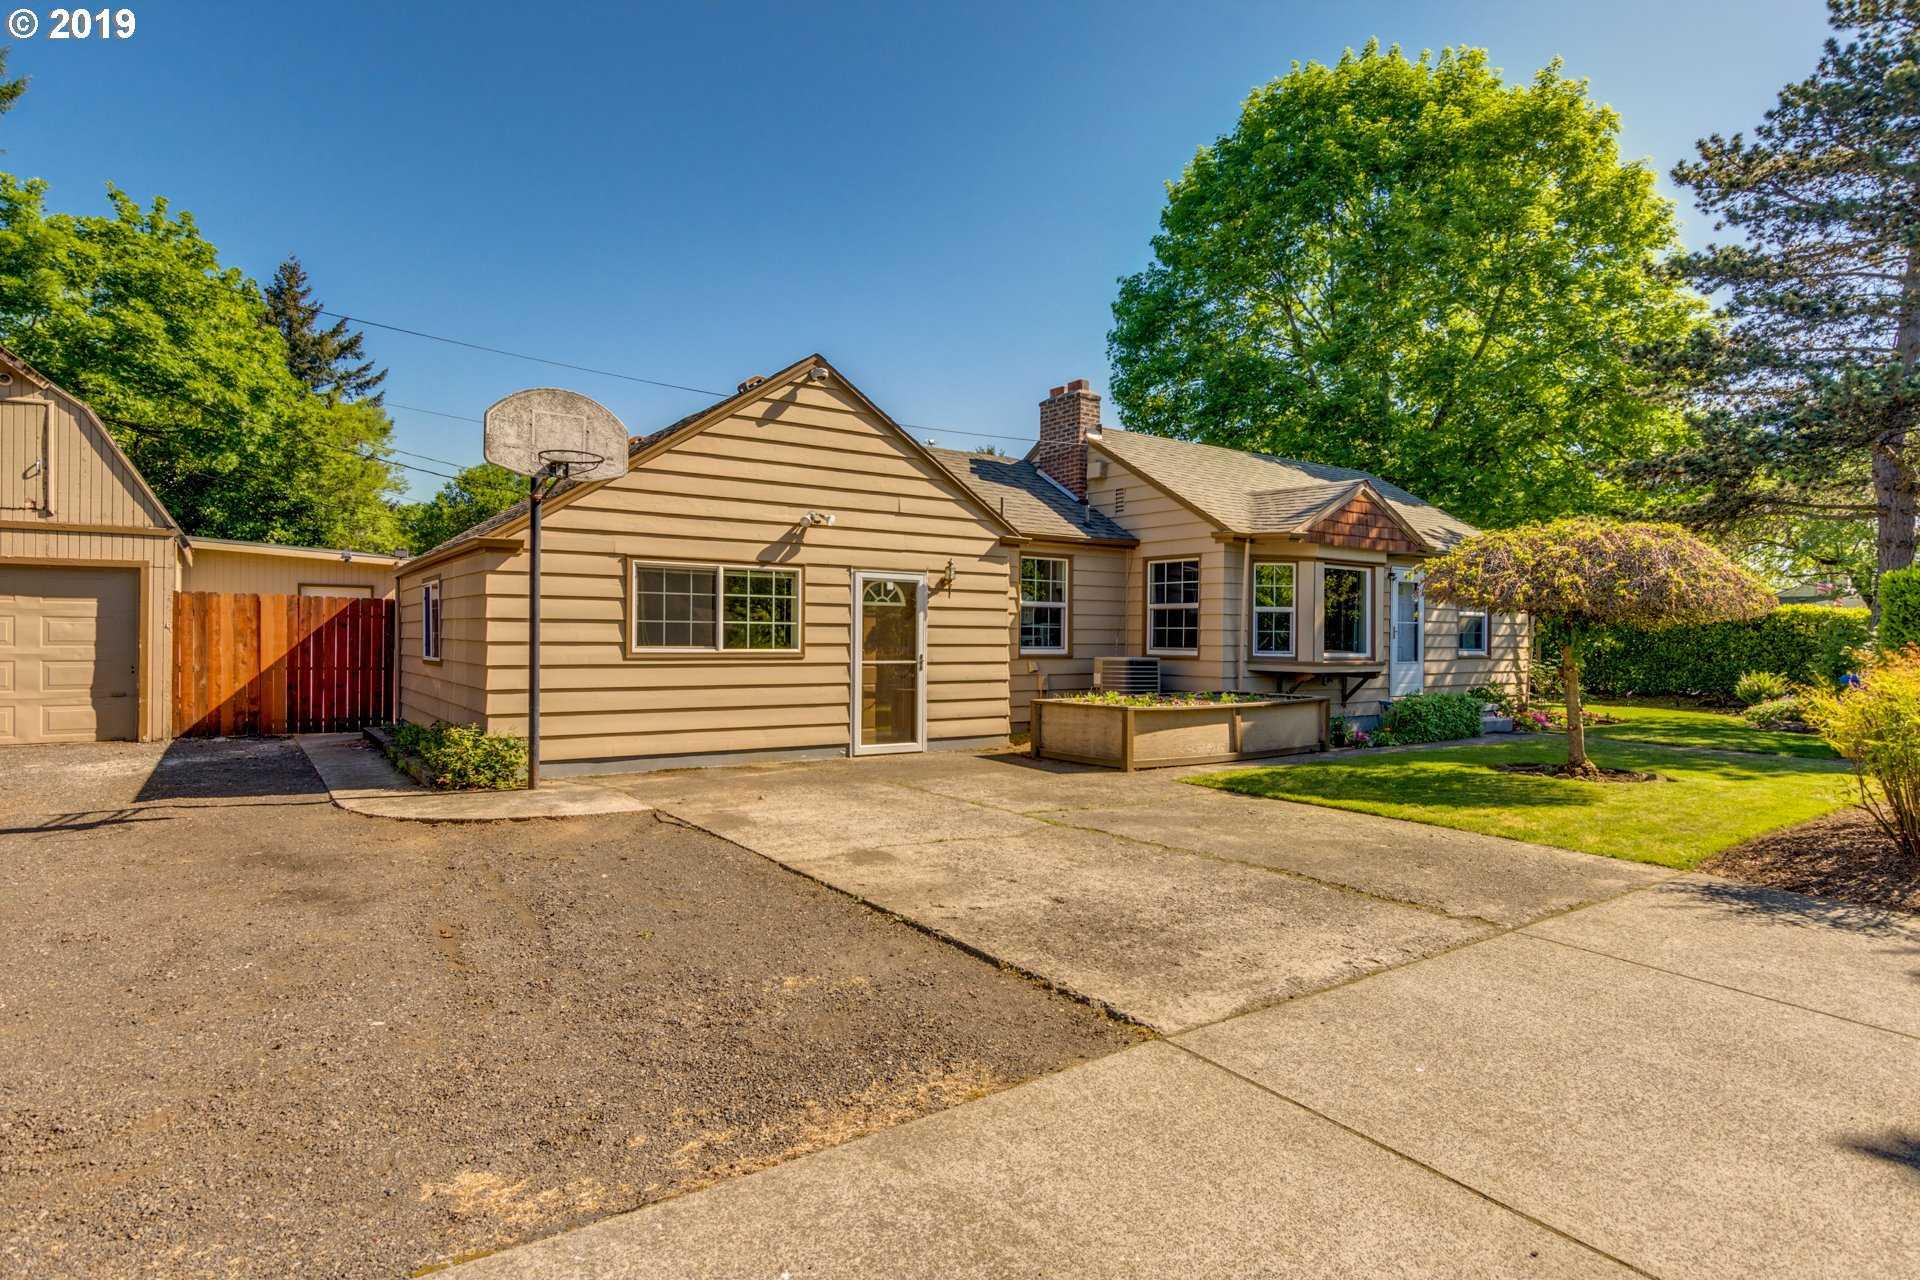 $339,900 - 2Br/1Ba -  for Sale in Lents/powellhurst-gilbert, Portland